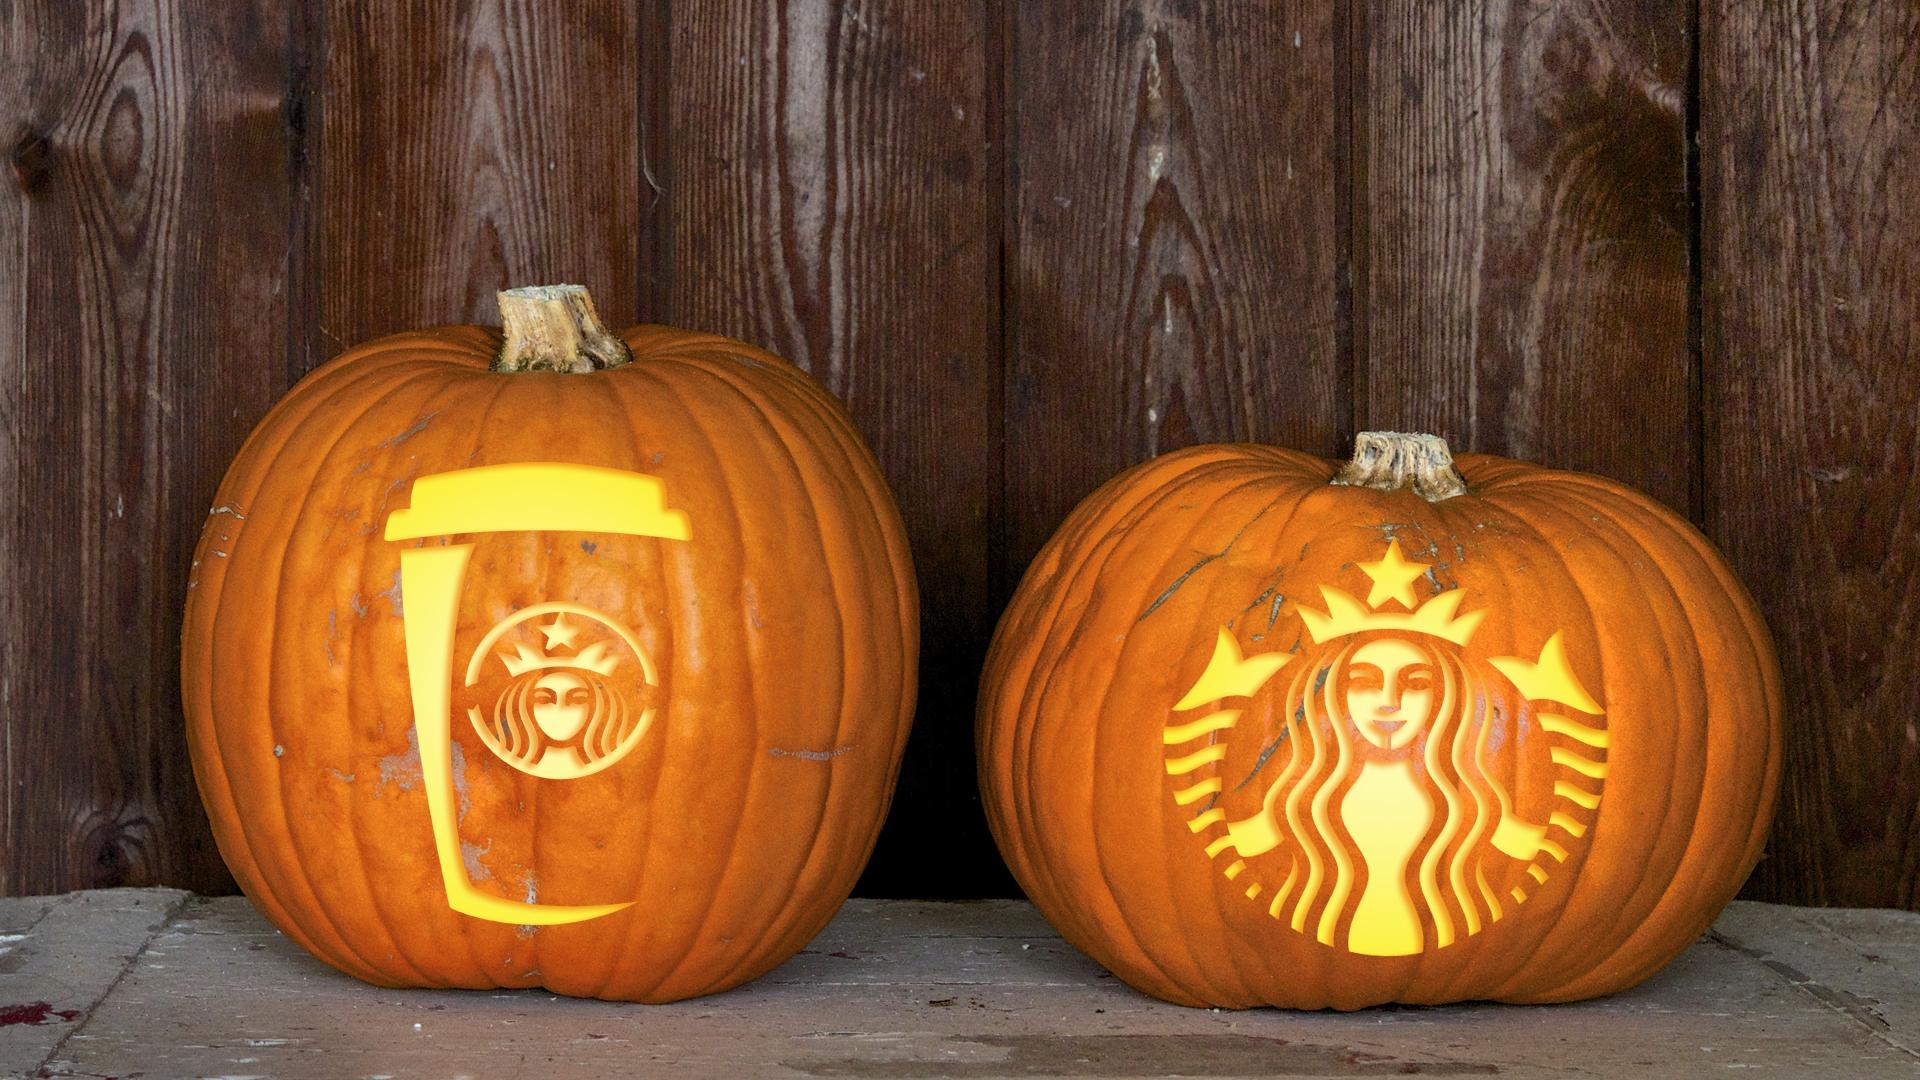 Starbucks pumpkin carving templates